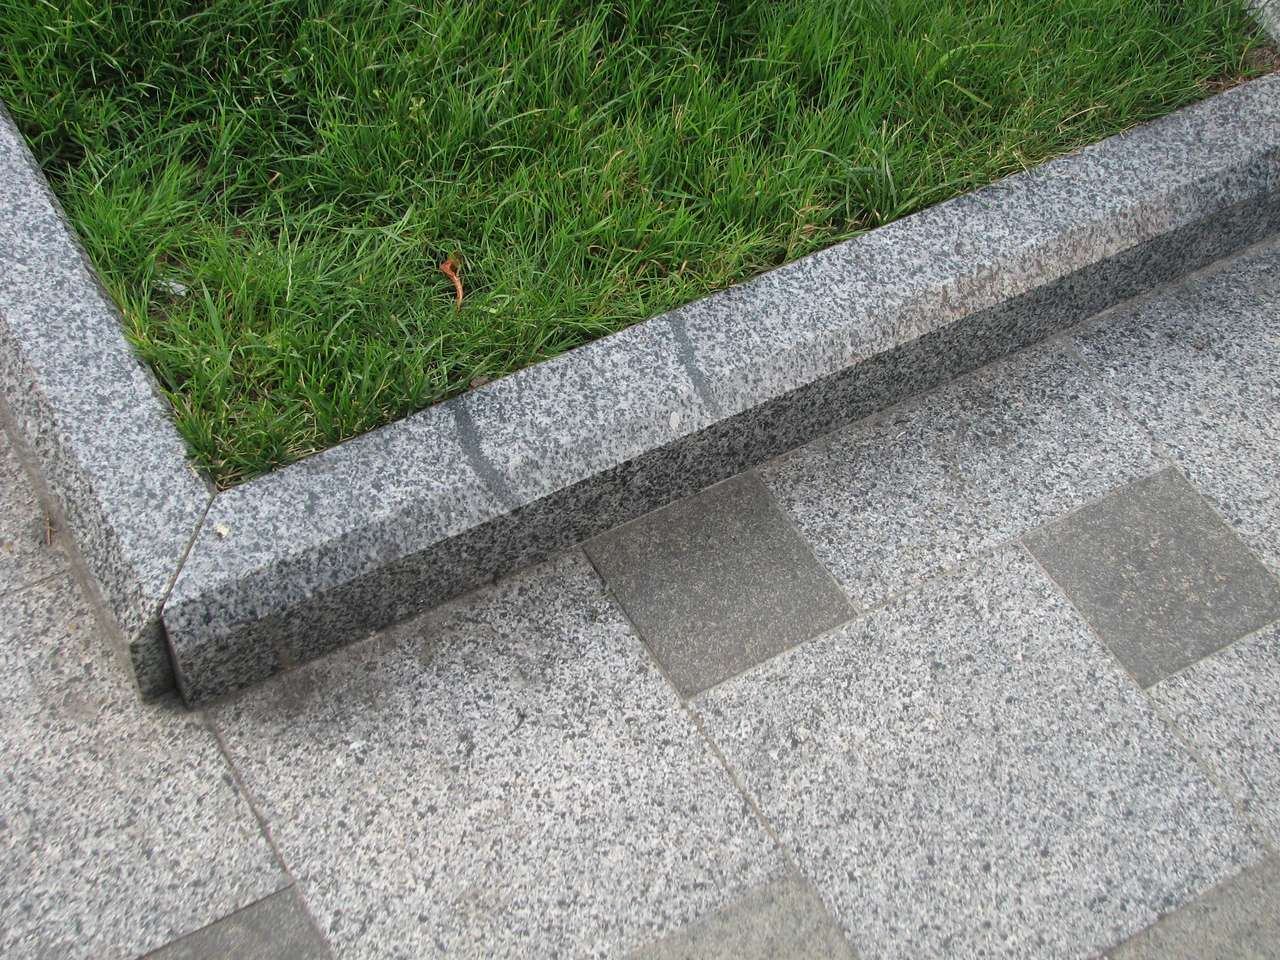 Granite Block Curb : В Петербурге открыли памятник поребрику фото